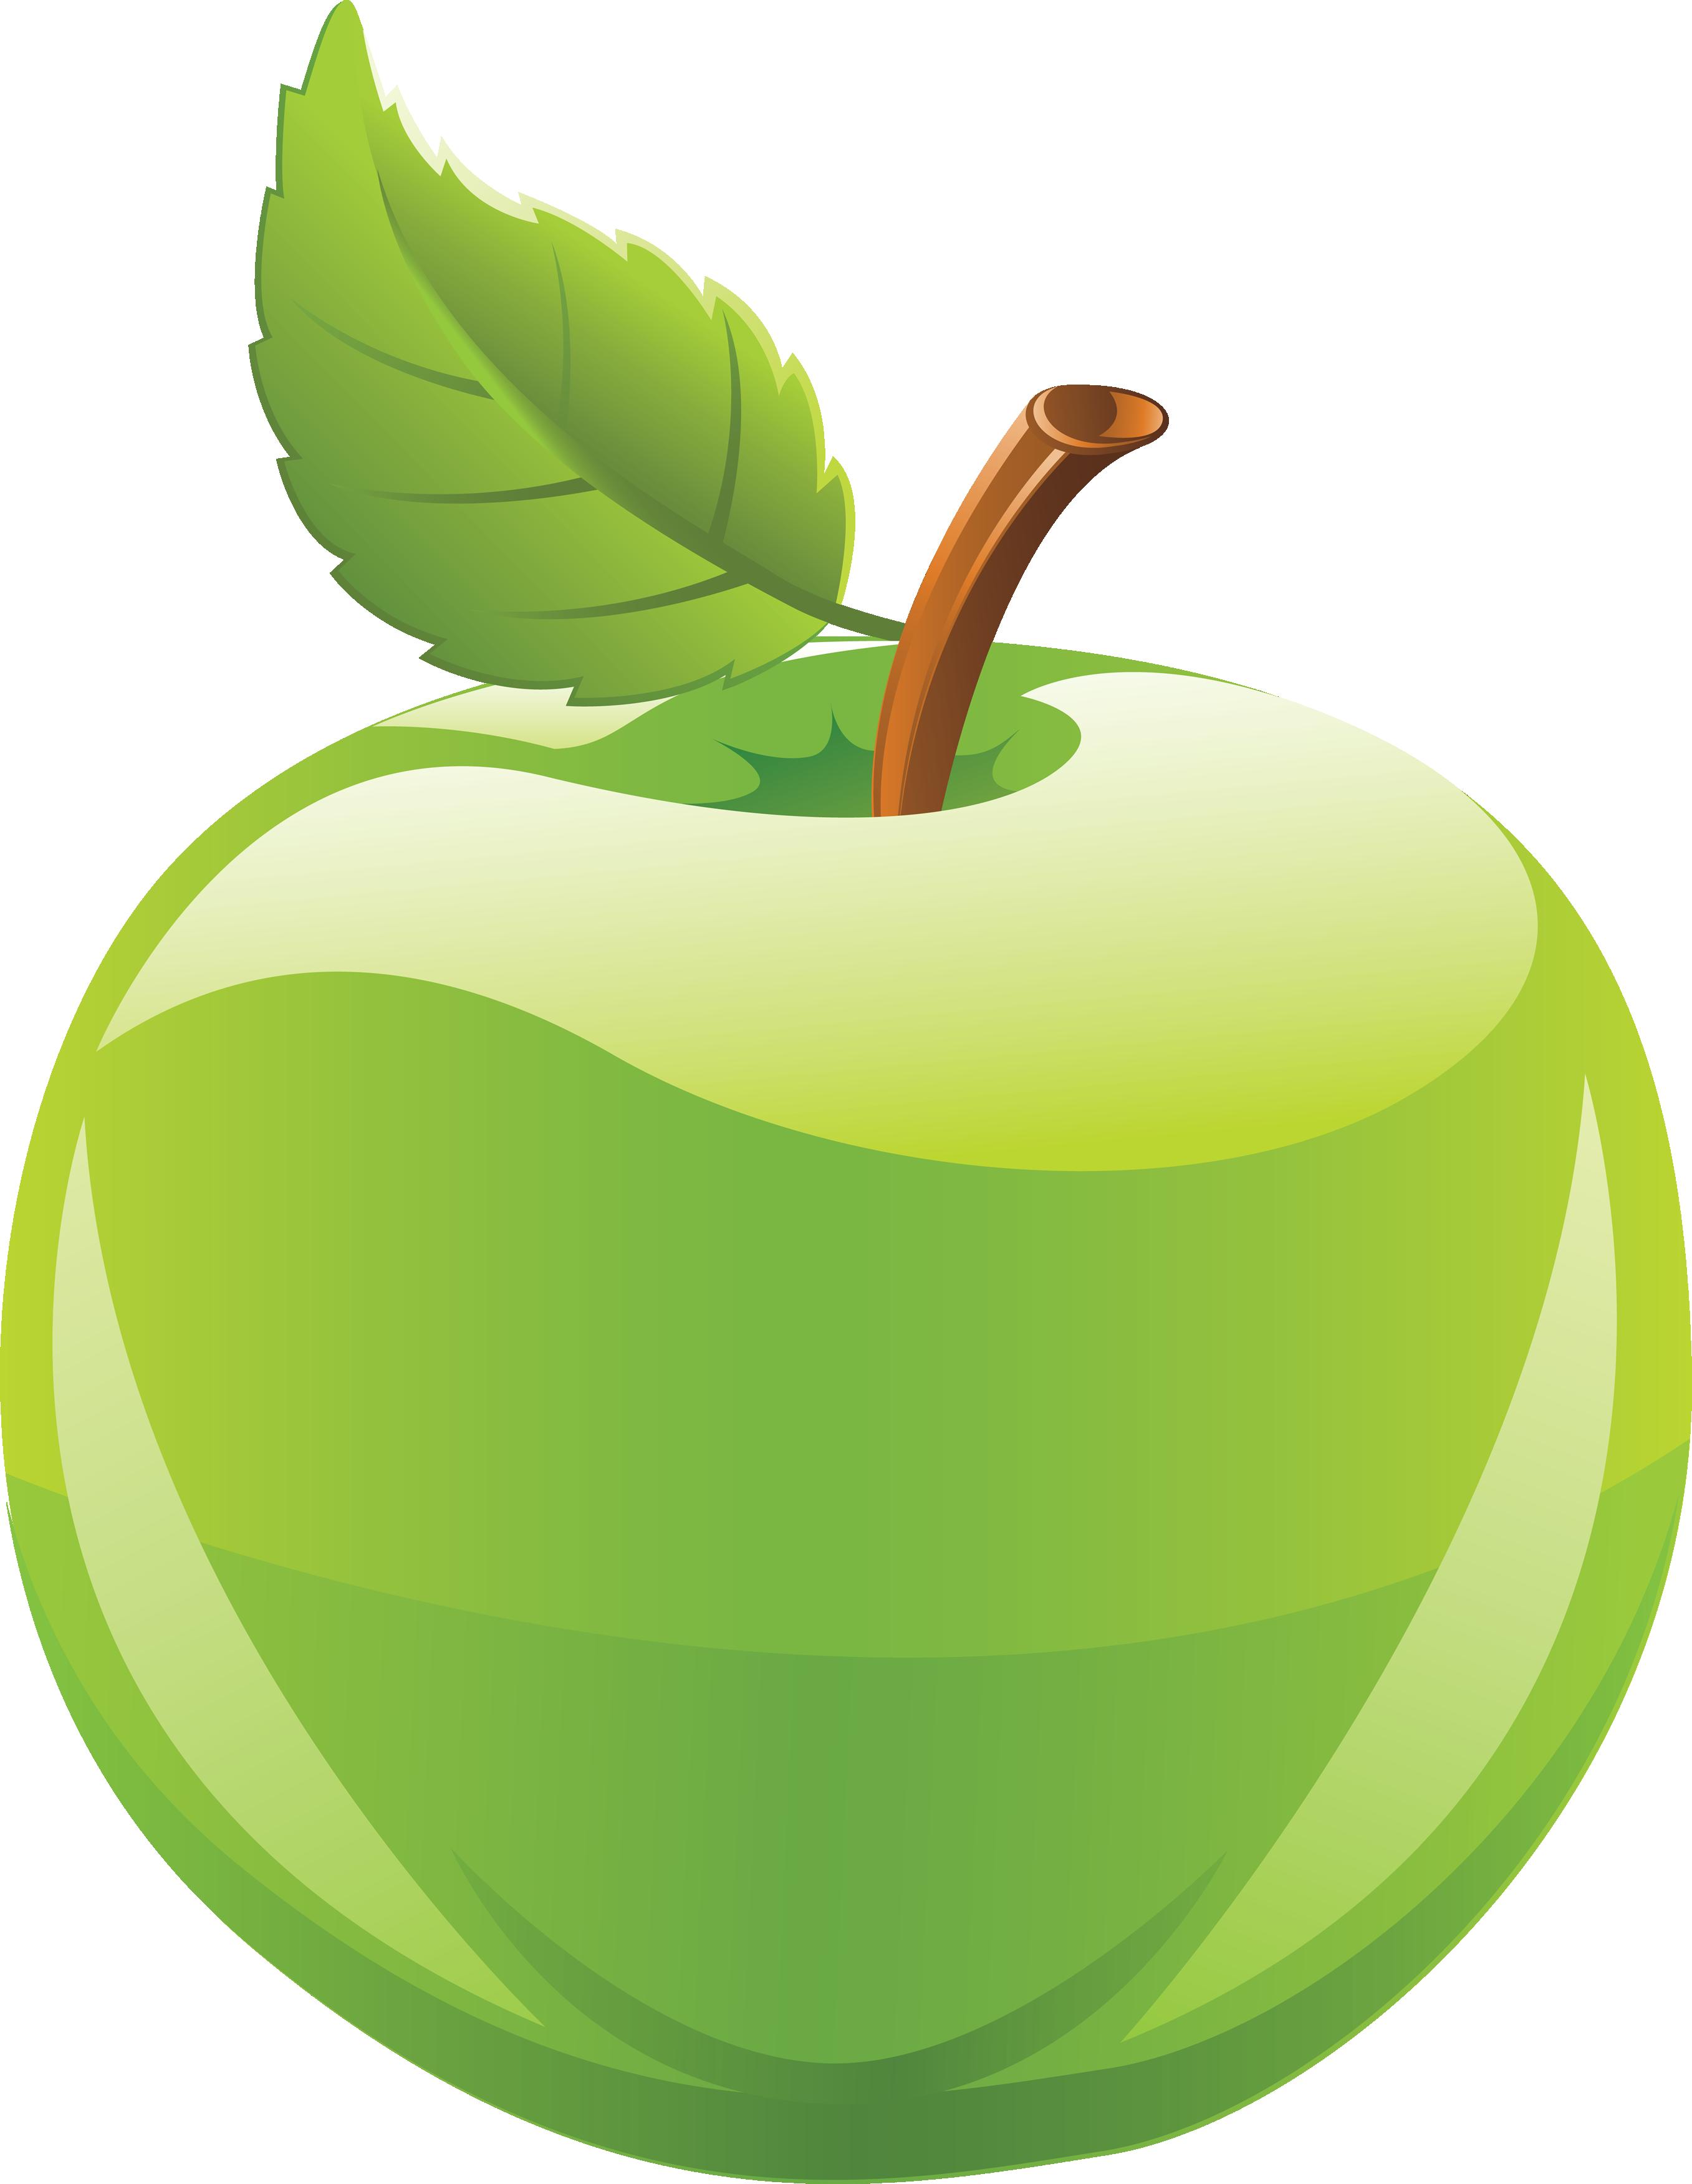 2714x3504 Fruits Green Apple Clipart